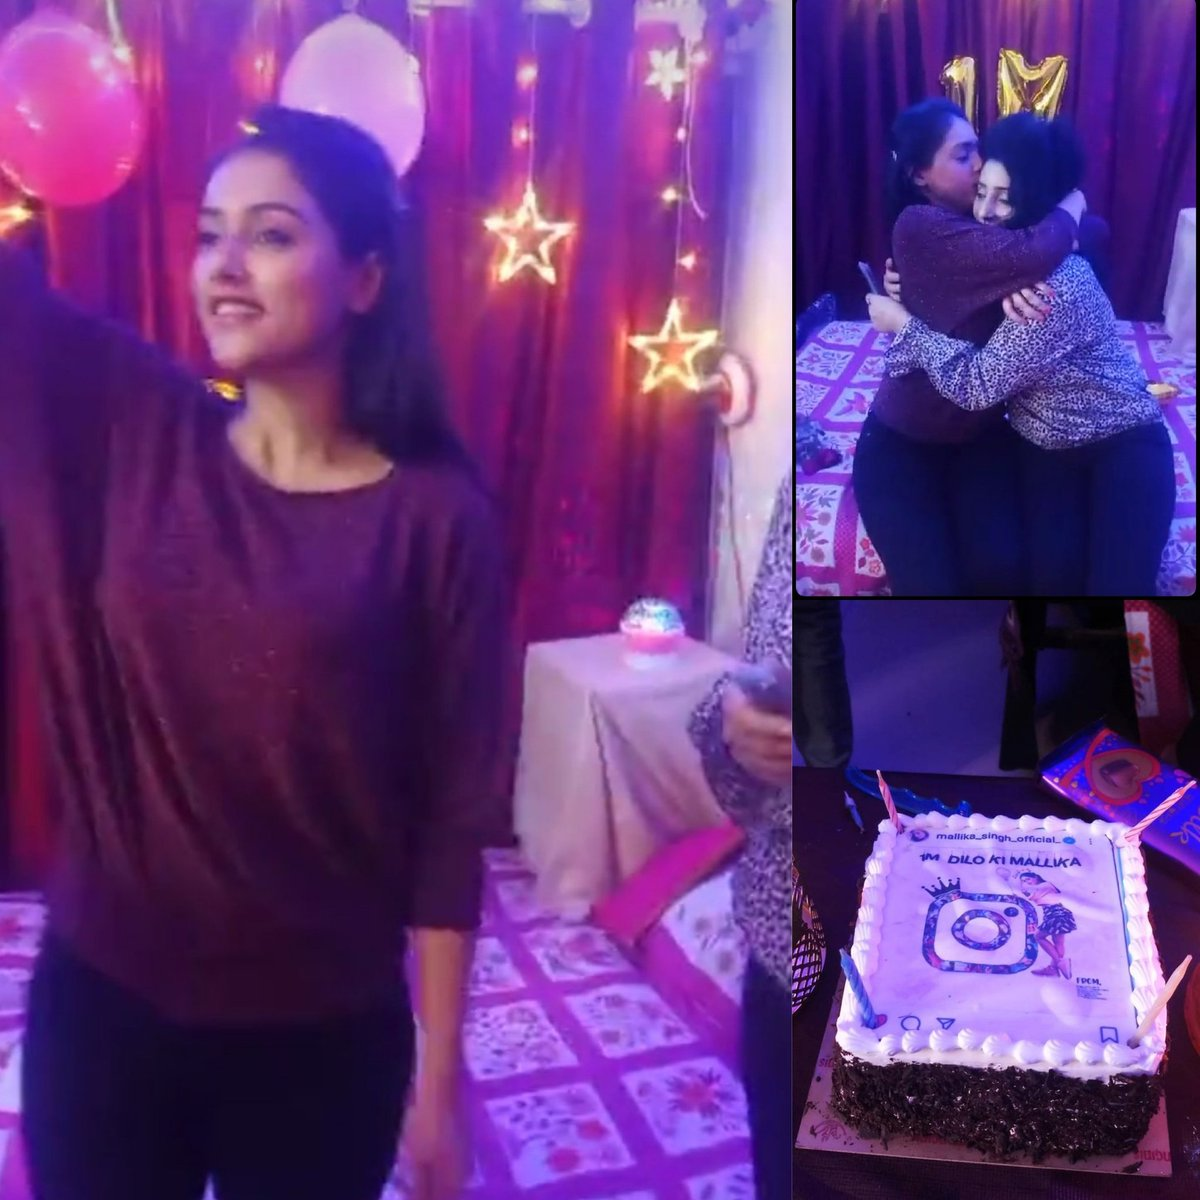 Her happiness is our success ❤️✨ #MallikaSingh #1mdilonkimallika